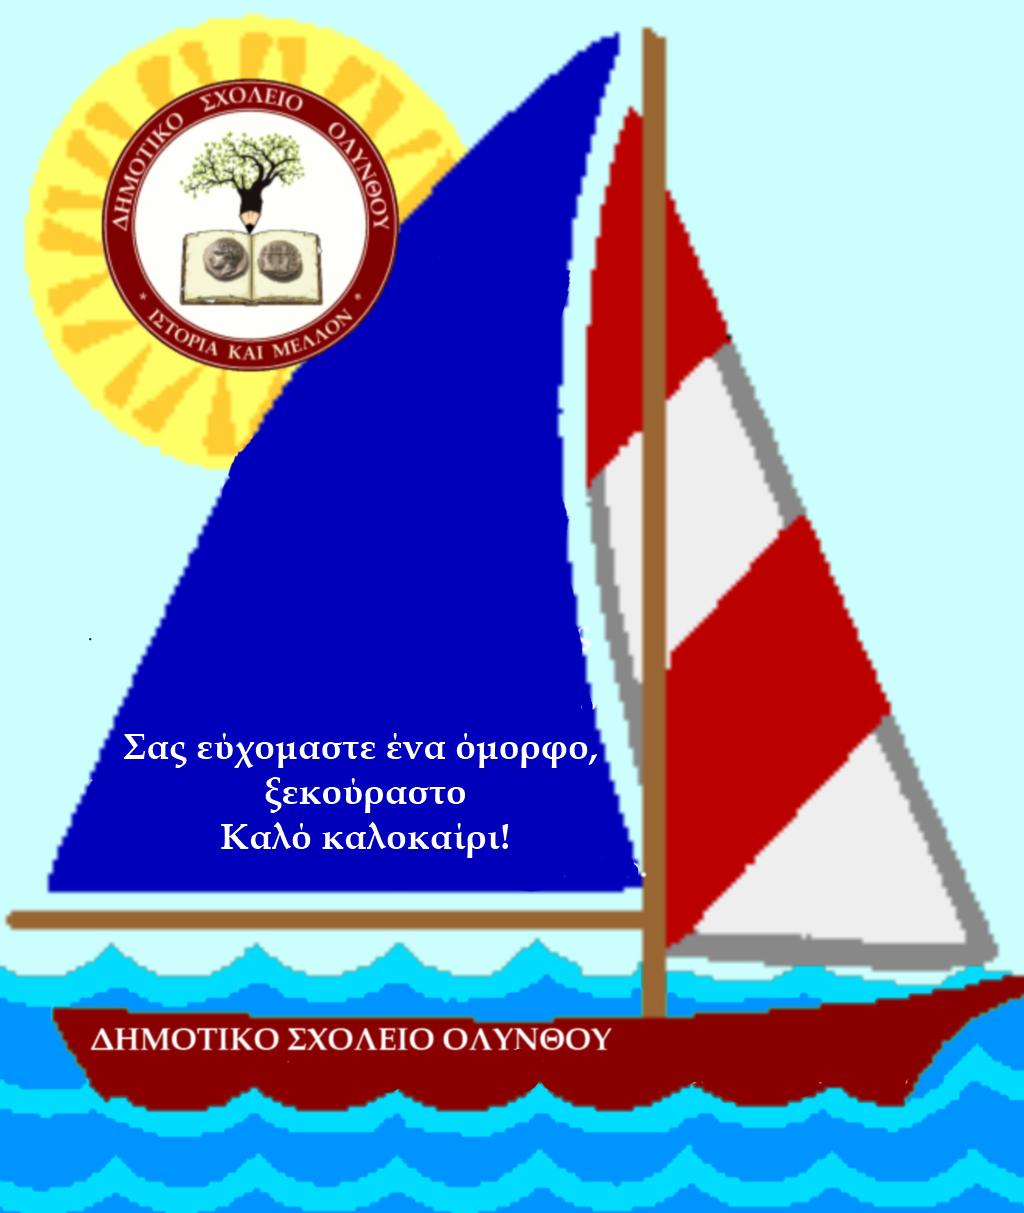 Kartatelos_site